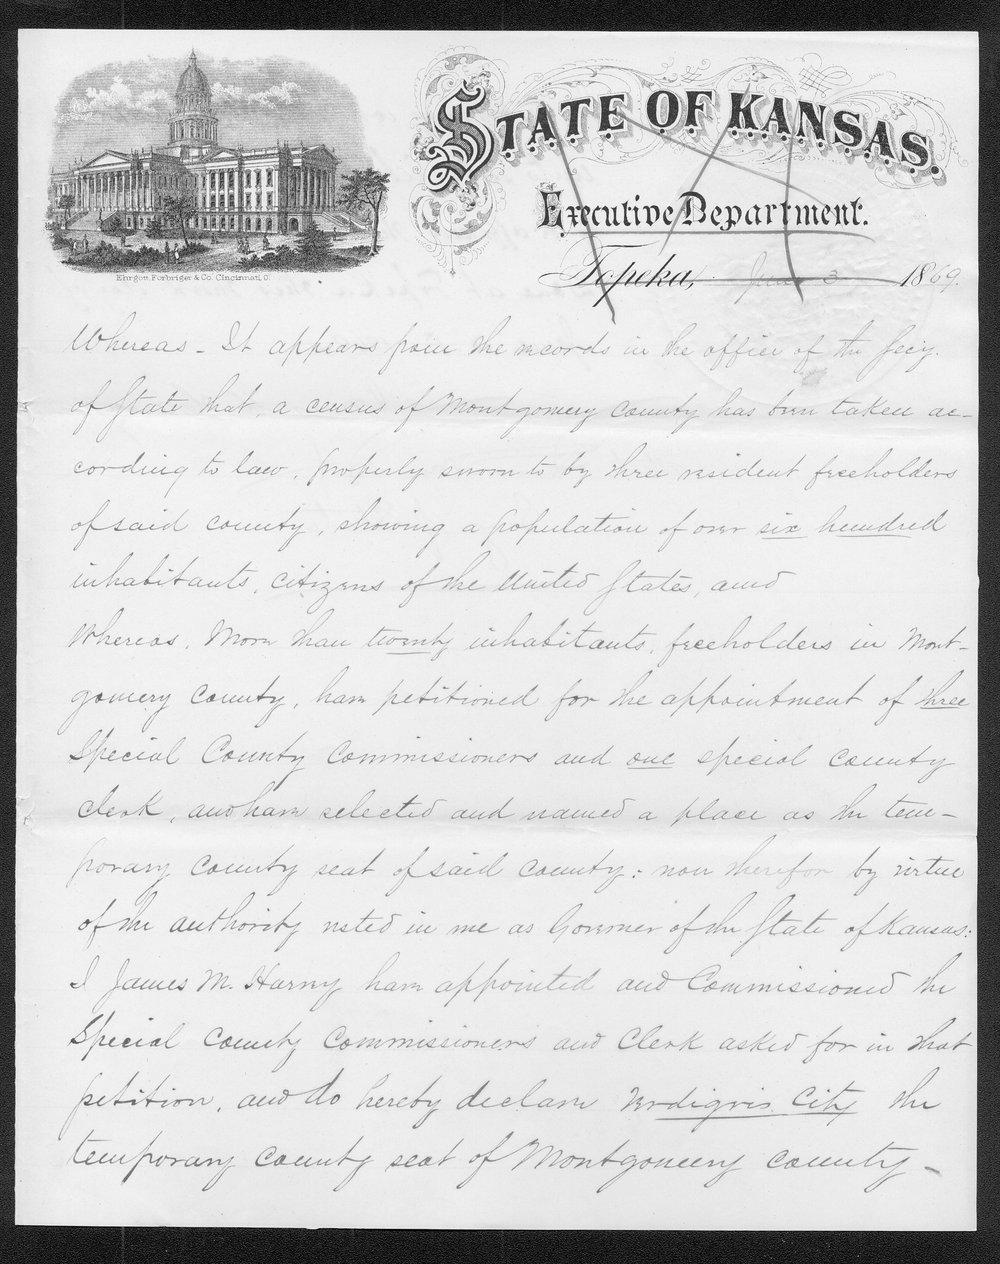 Montgomery County organization records - 1